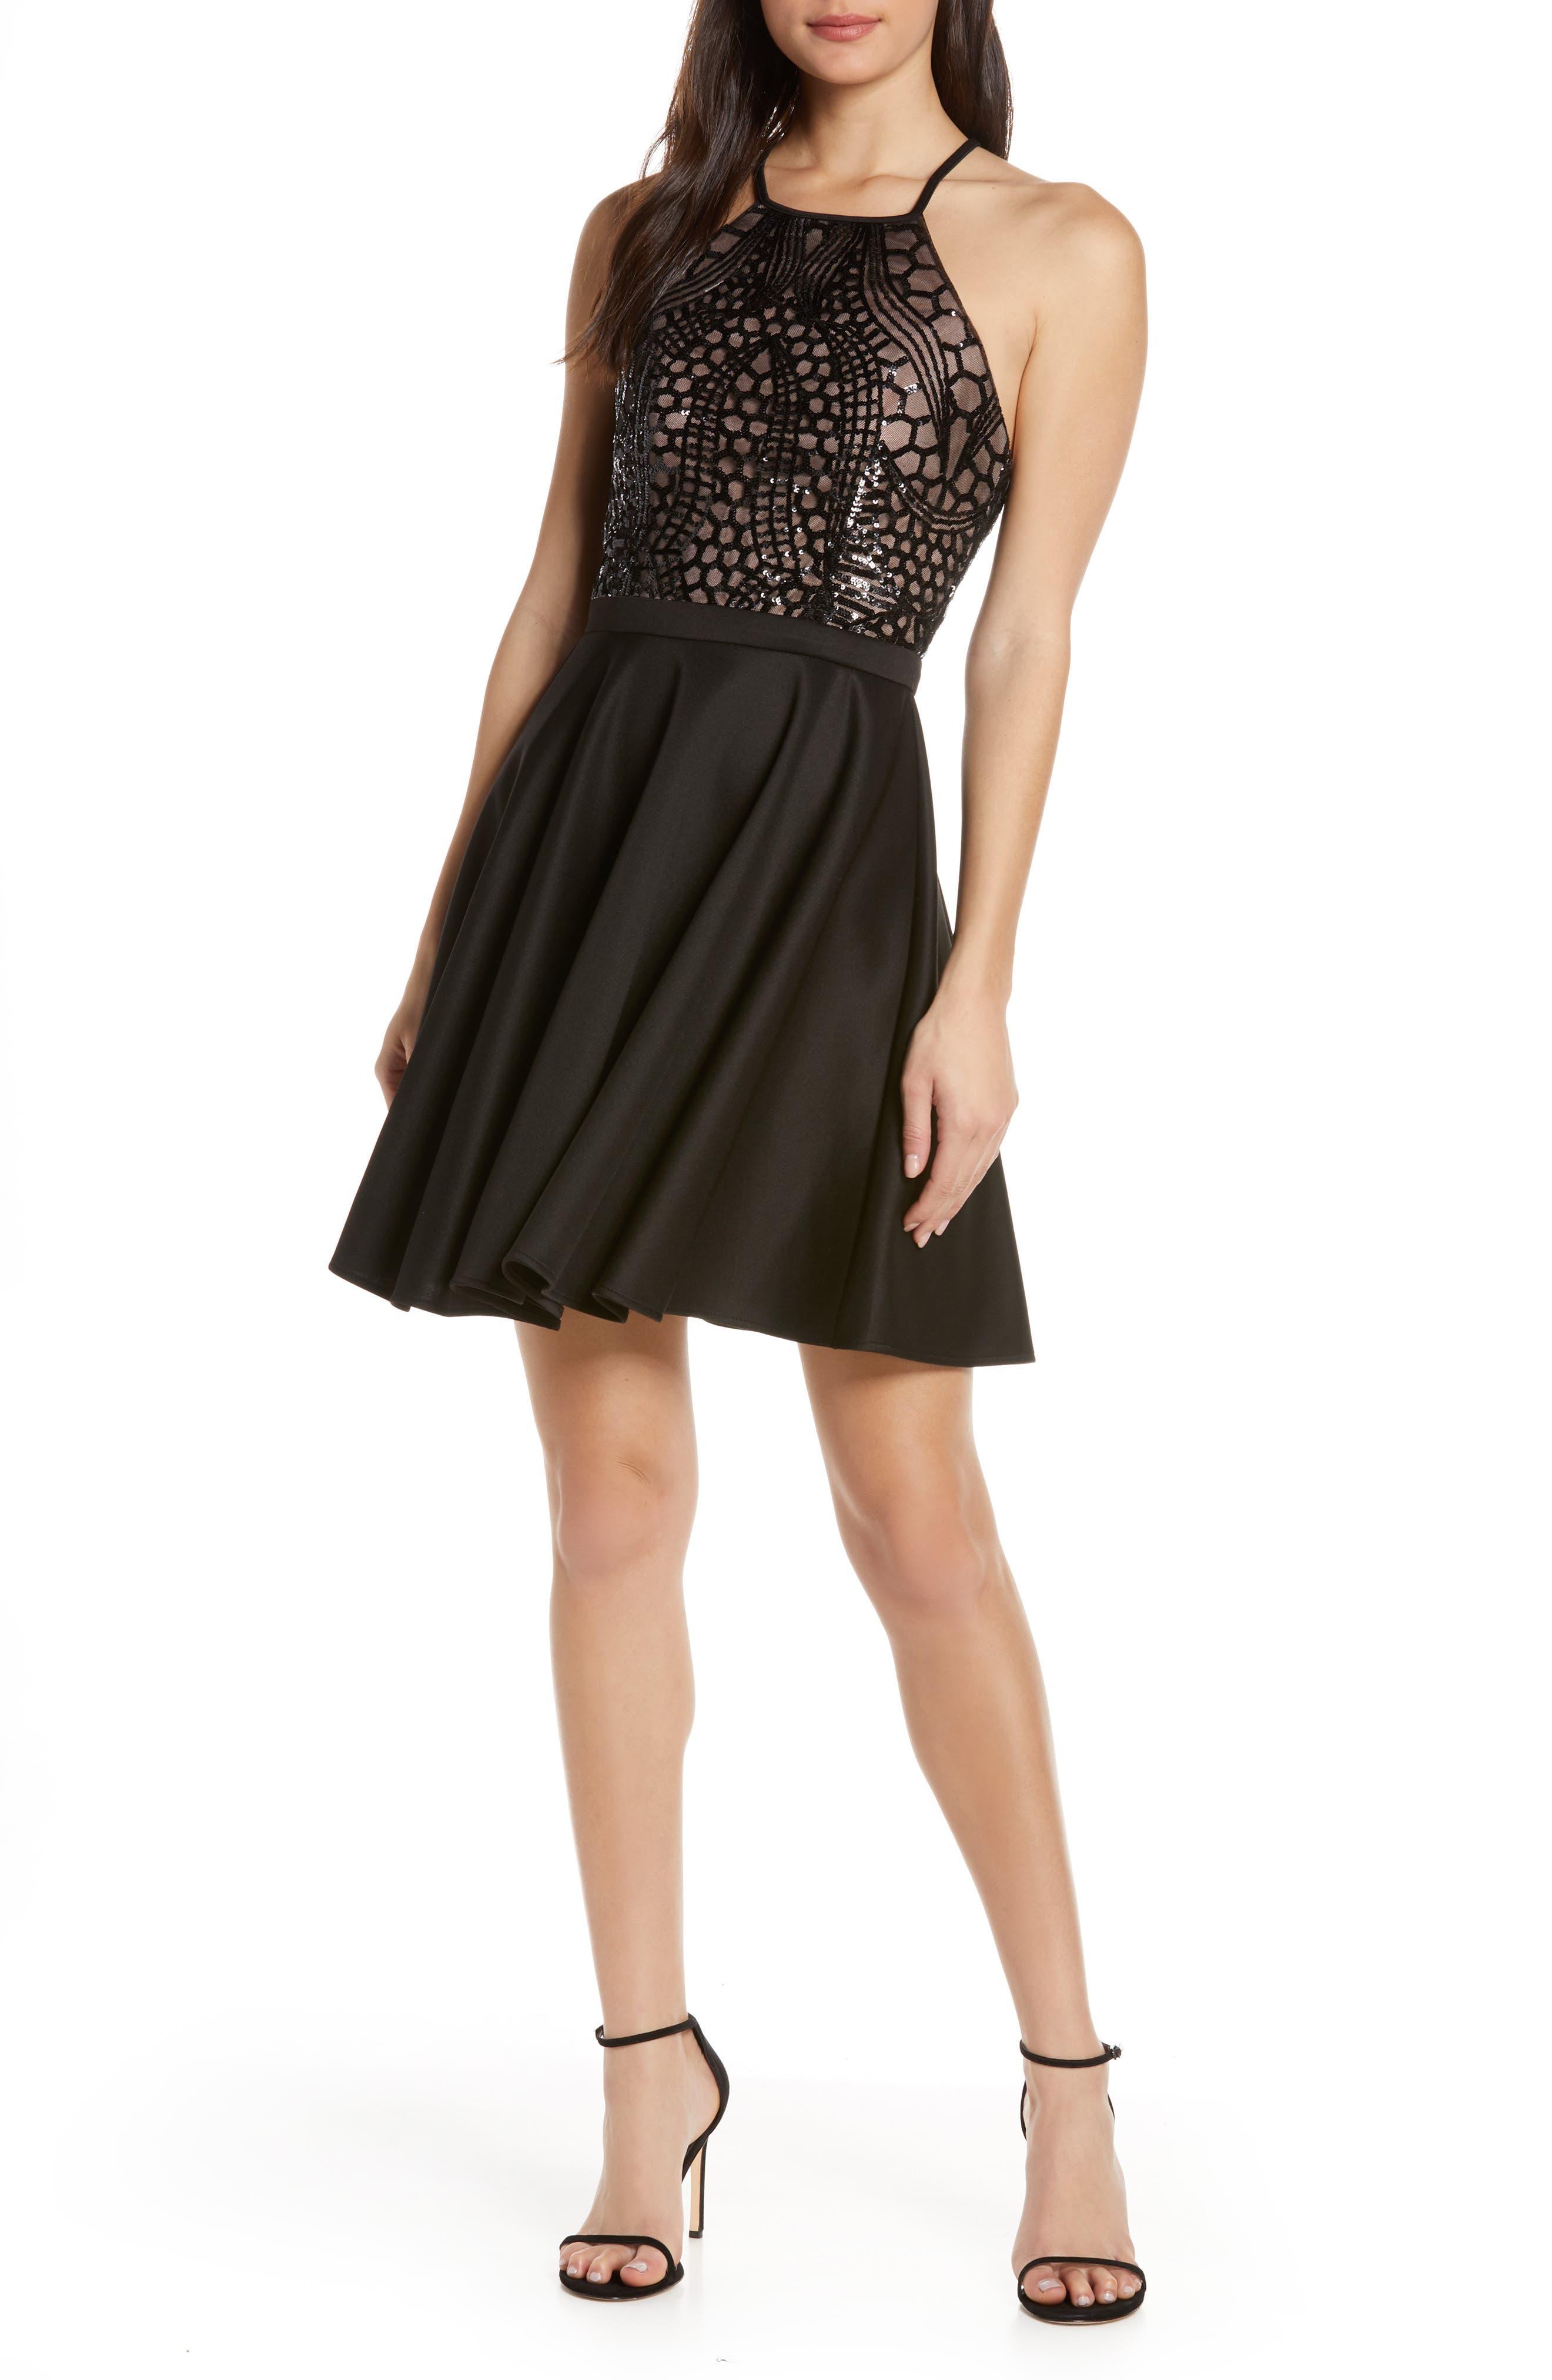 Morgan & Co. Strappy Lace & Sequin Bodice Party Dress, Black